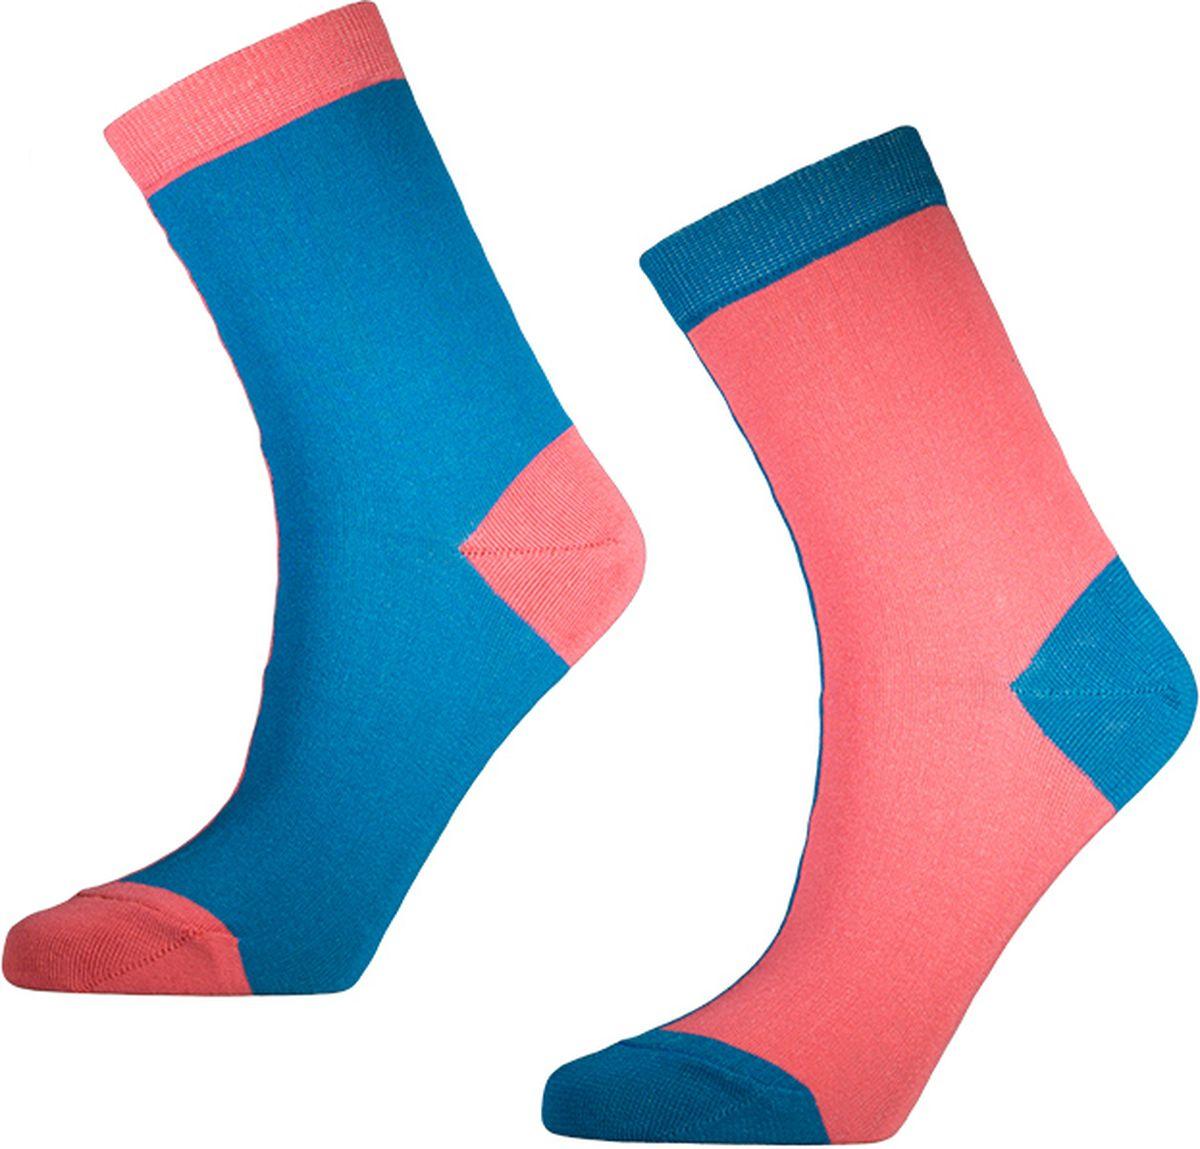 Носки мужские Big Bang Socks, цвет: розовый, голубой, 2 пары. d451. Размер 40/44 носки minecraft socks 3 pack green зеленые s 3 пары 11750